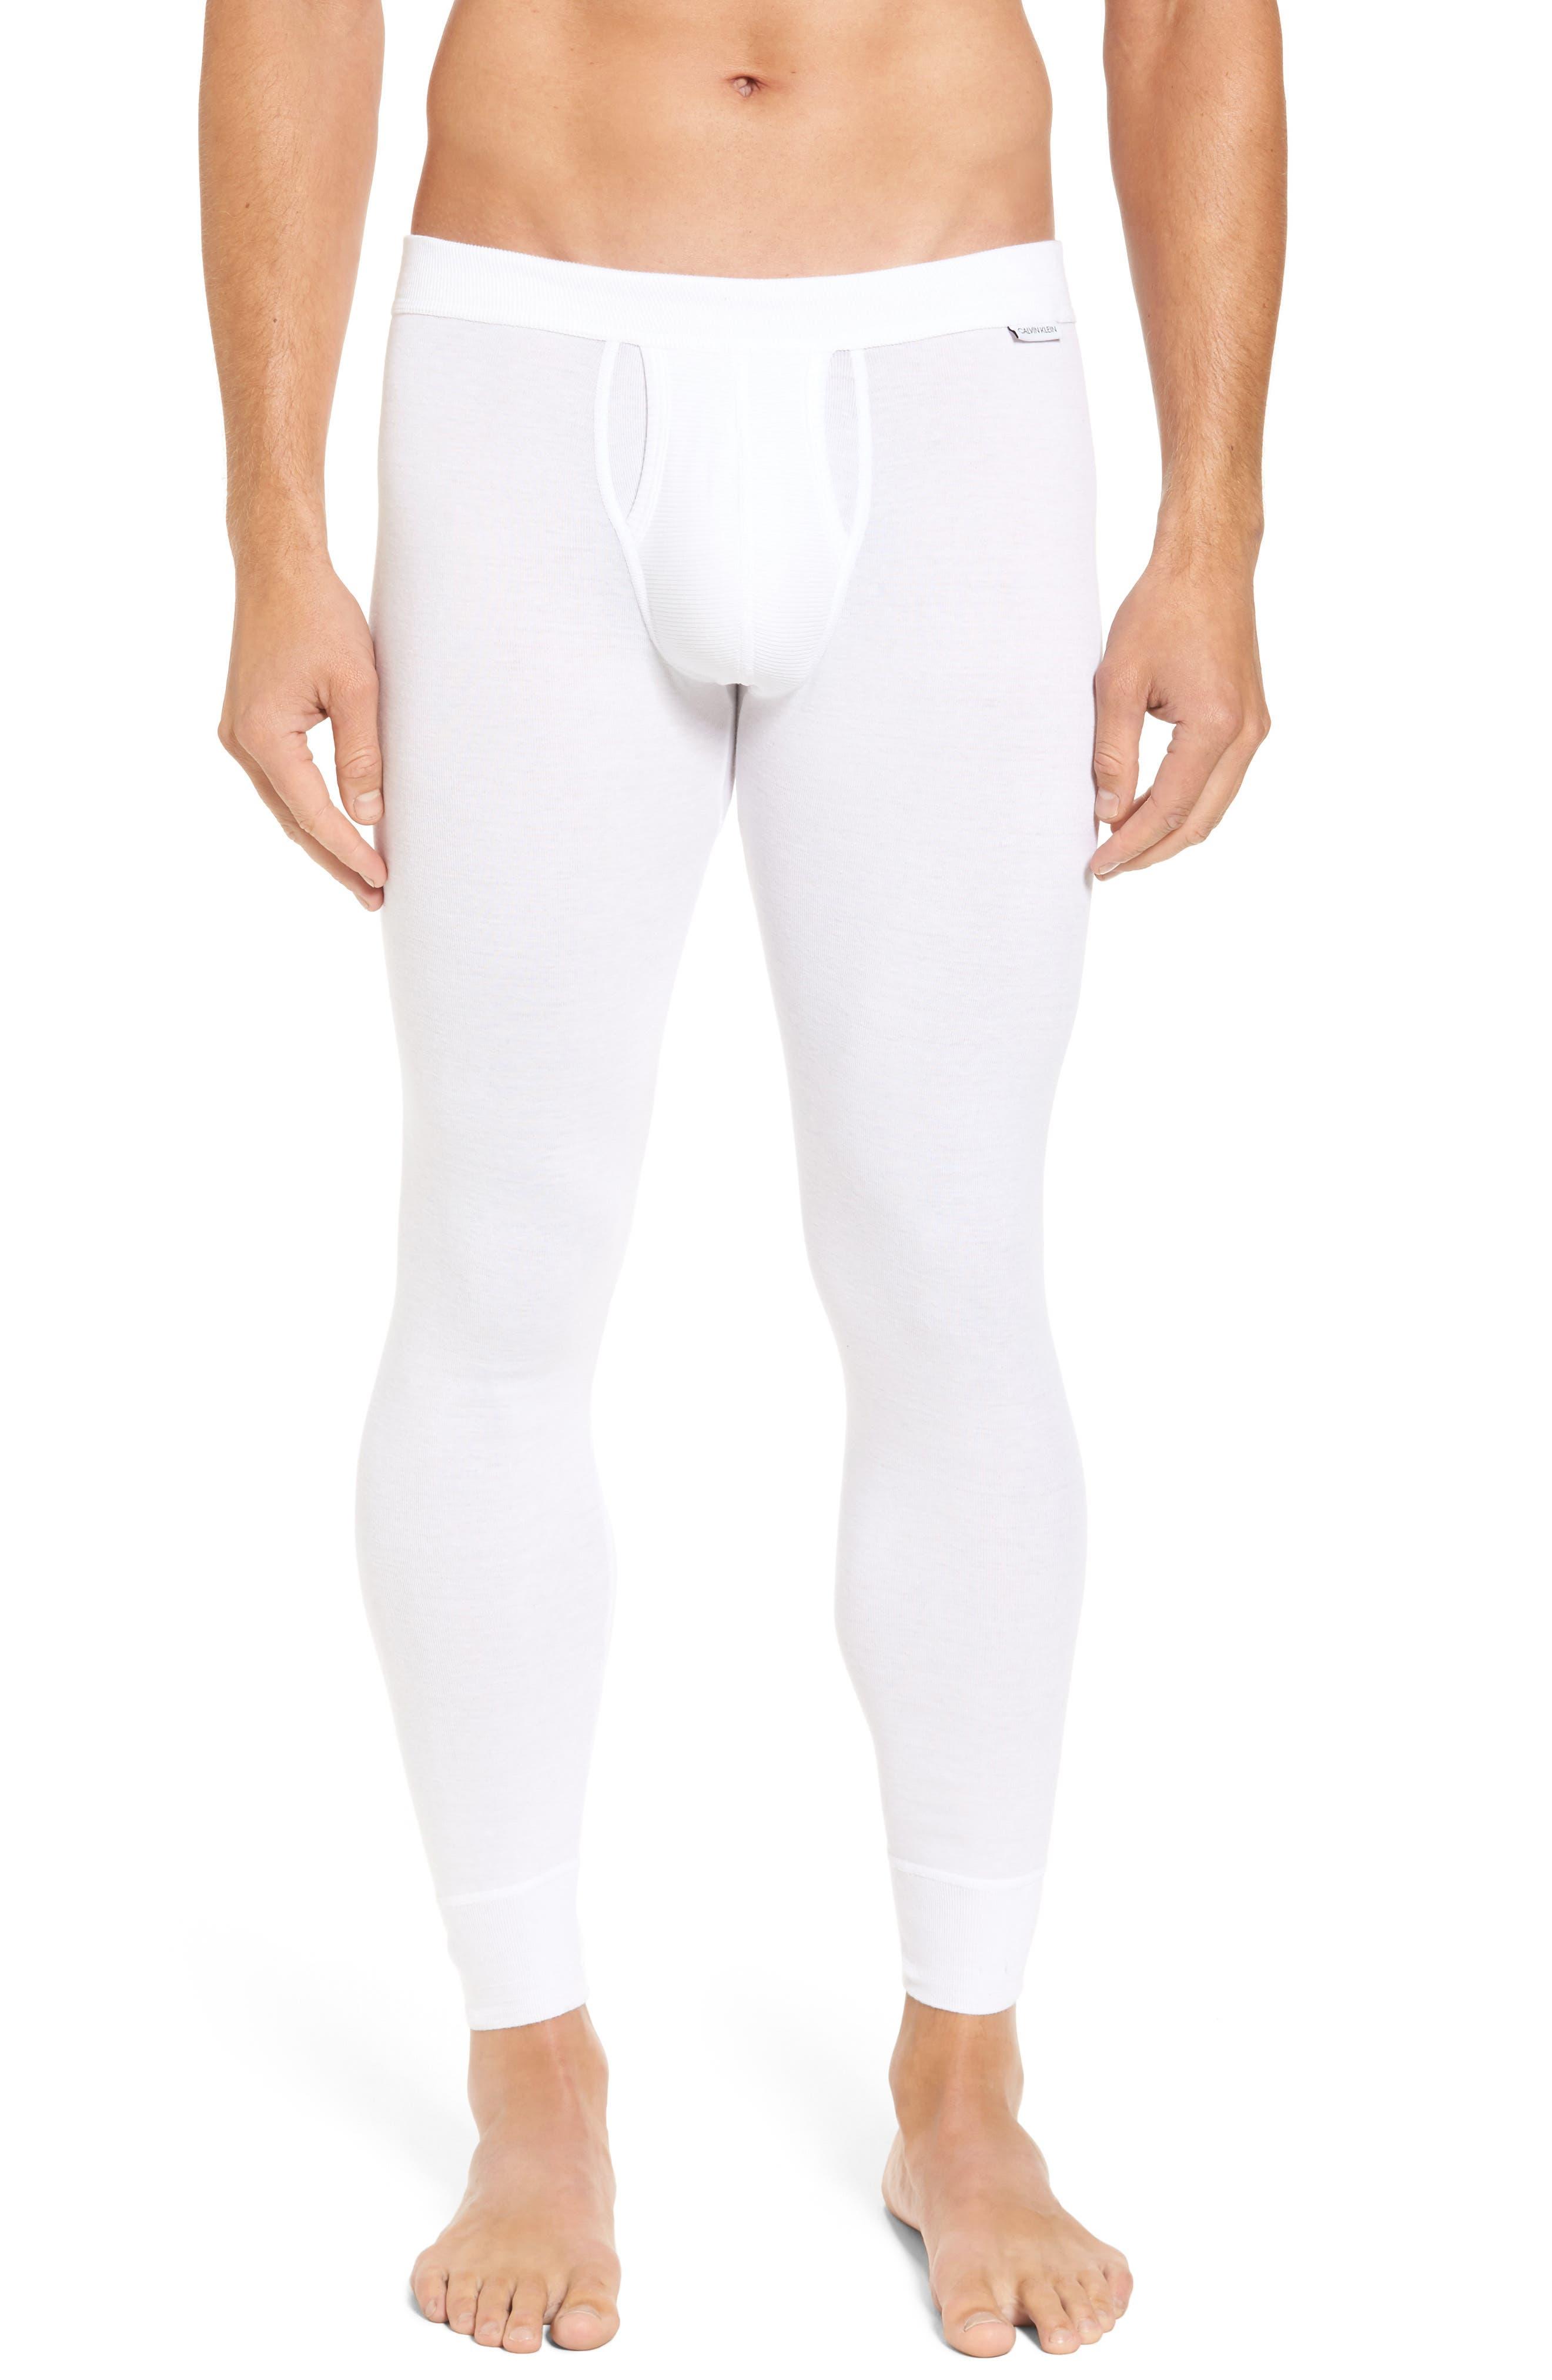 Calvin Klein 205W39NYC Concept Authentic Cotton Long Johns